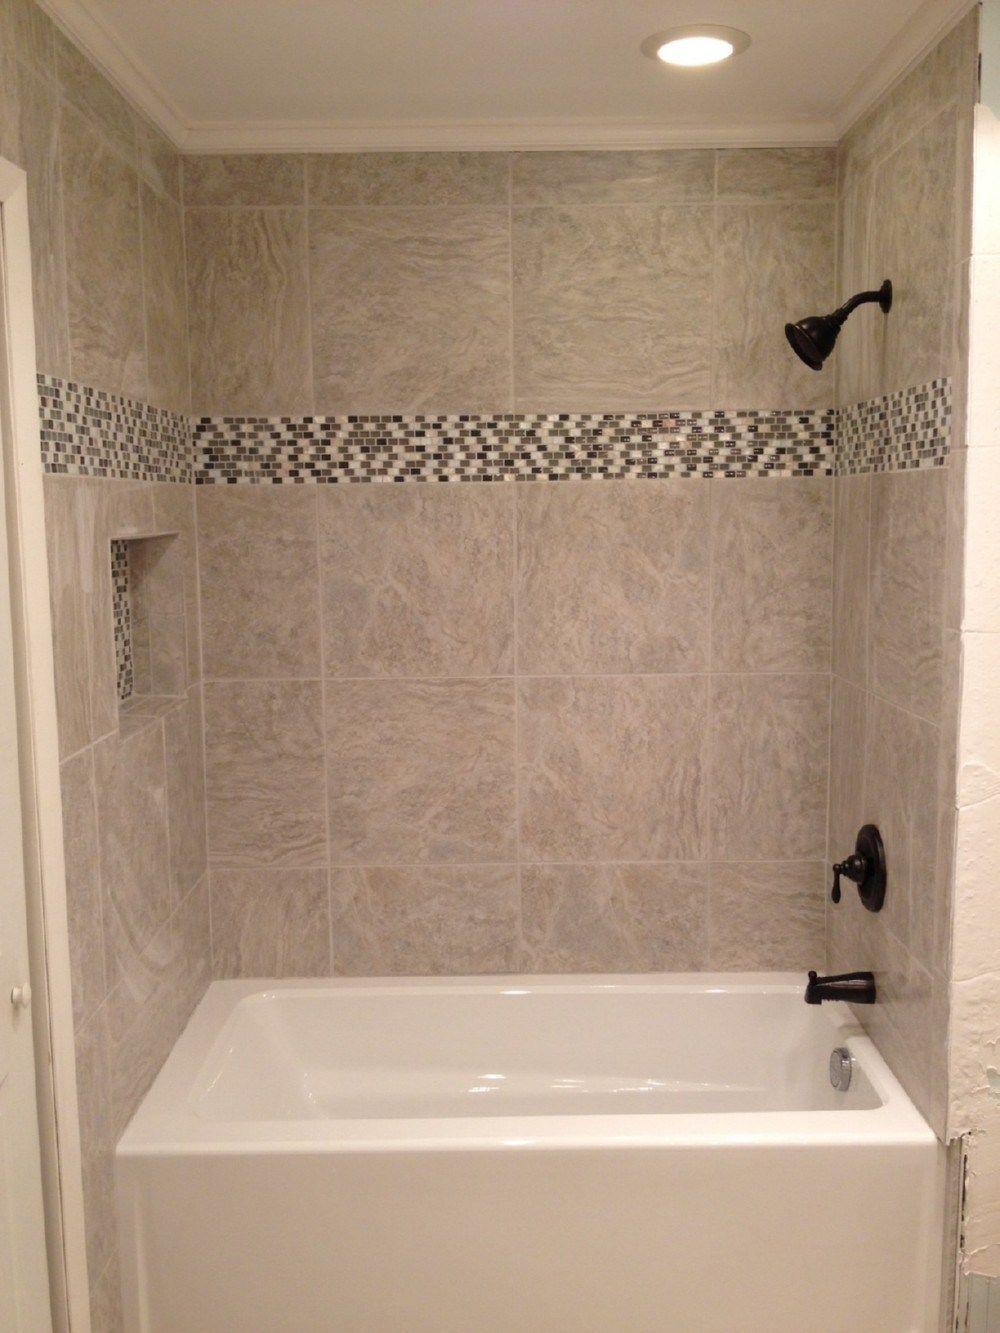 Cozy Small Bathroom Shower With Tub Tile Design Ideas 3 Tub Remodel Bathtubs For Small Bathrooms Bathtub Remodel